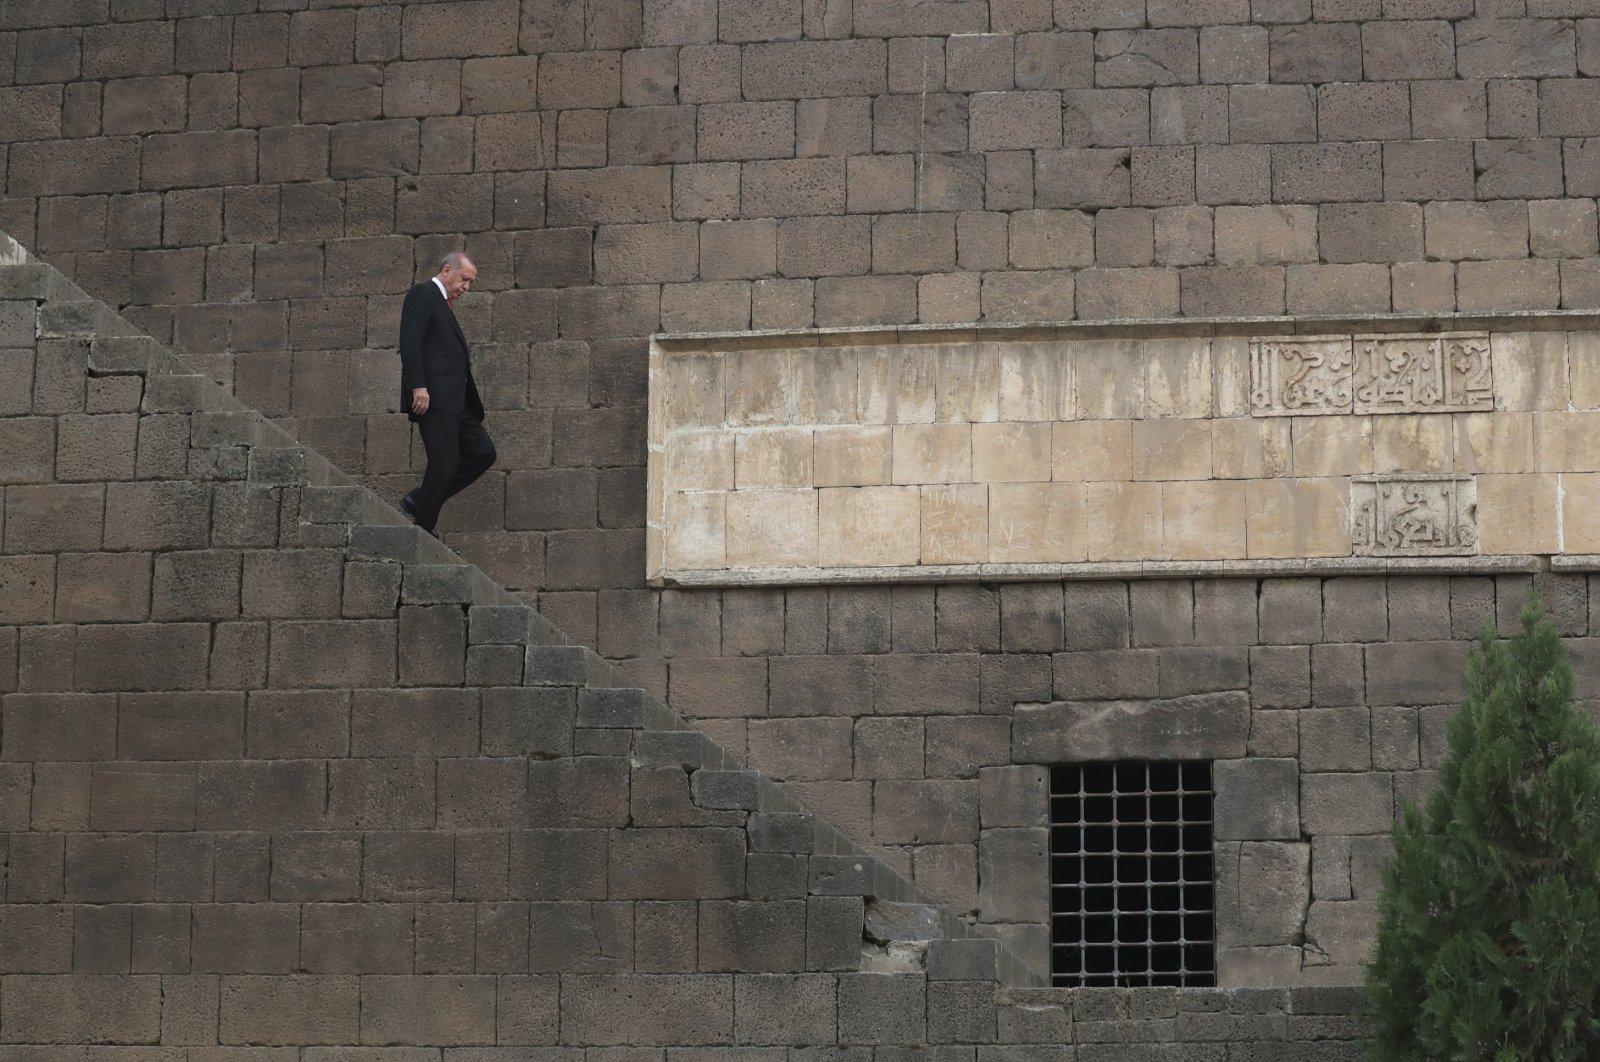 President Recep Tayyip Erdoğan visits the historical walls surrounding the old city of Diyarbakır, in Turkey's predominantly Kurdish southeast, Oct. 20, 2018. (AP Photo)